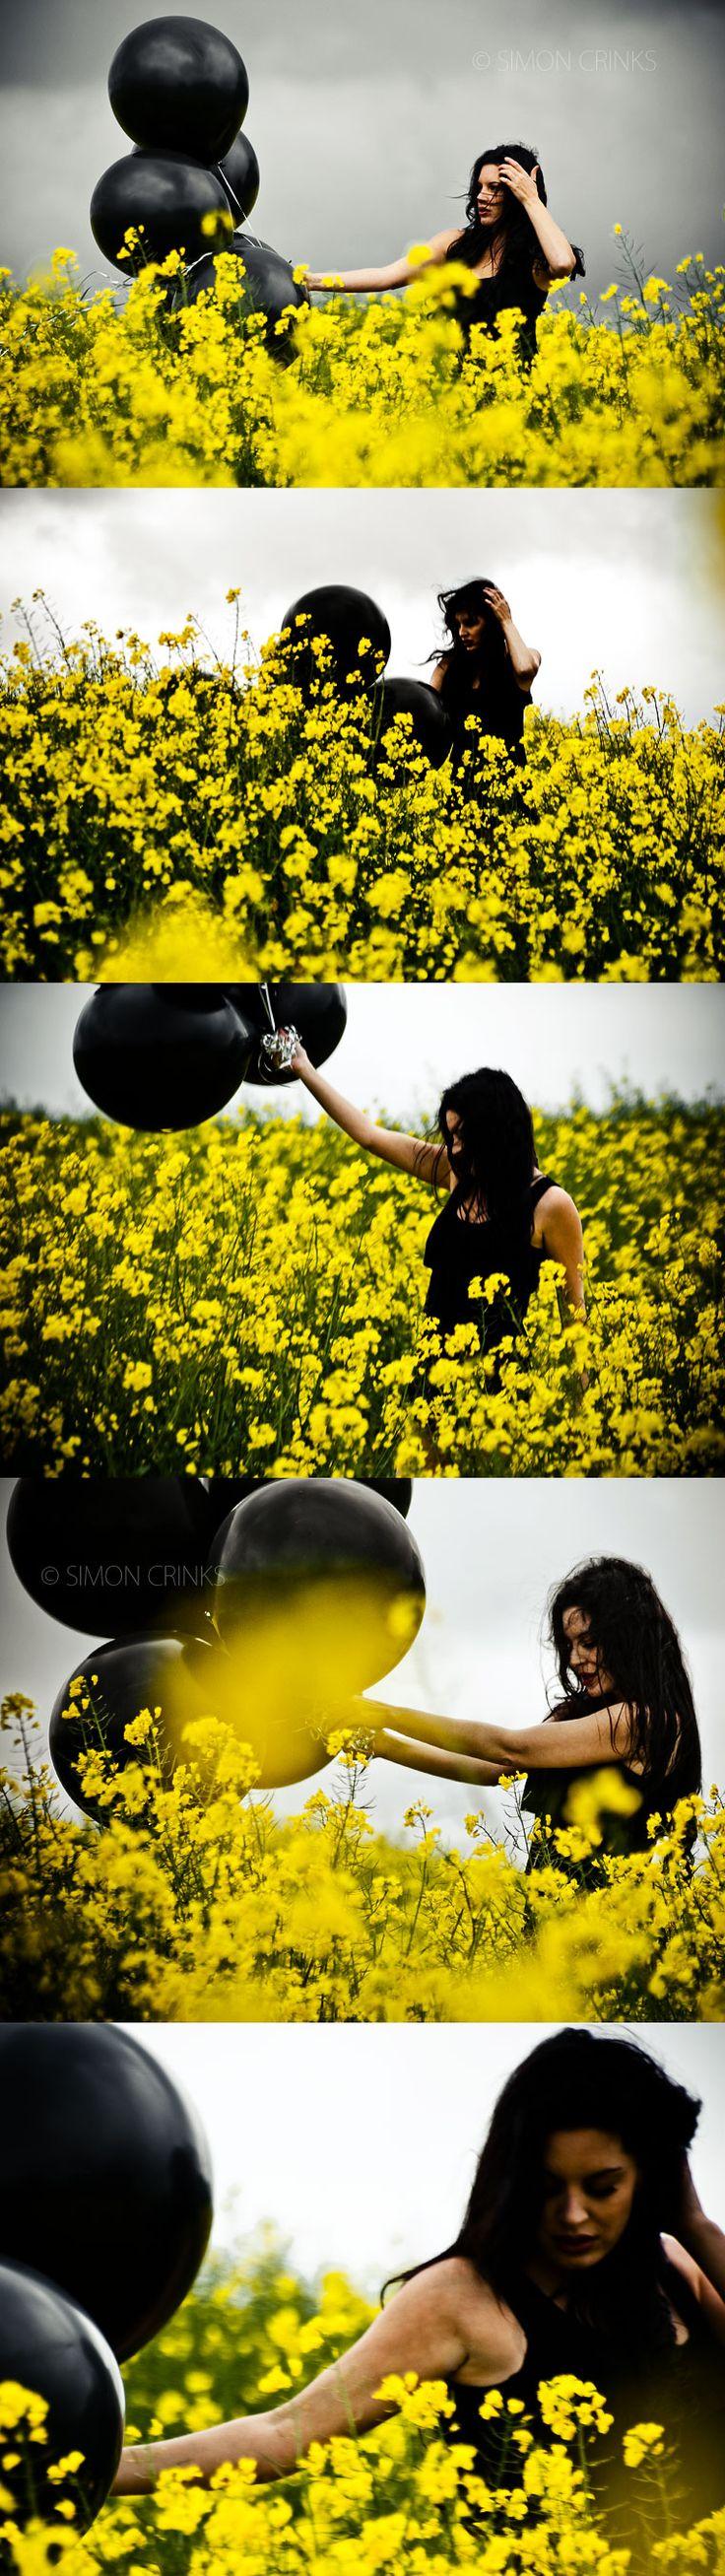 best photoshoots images on Pinterest Photoshop actions